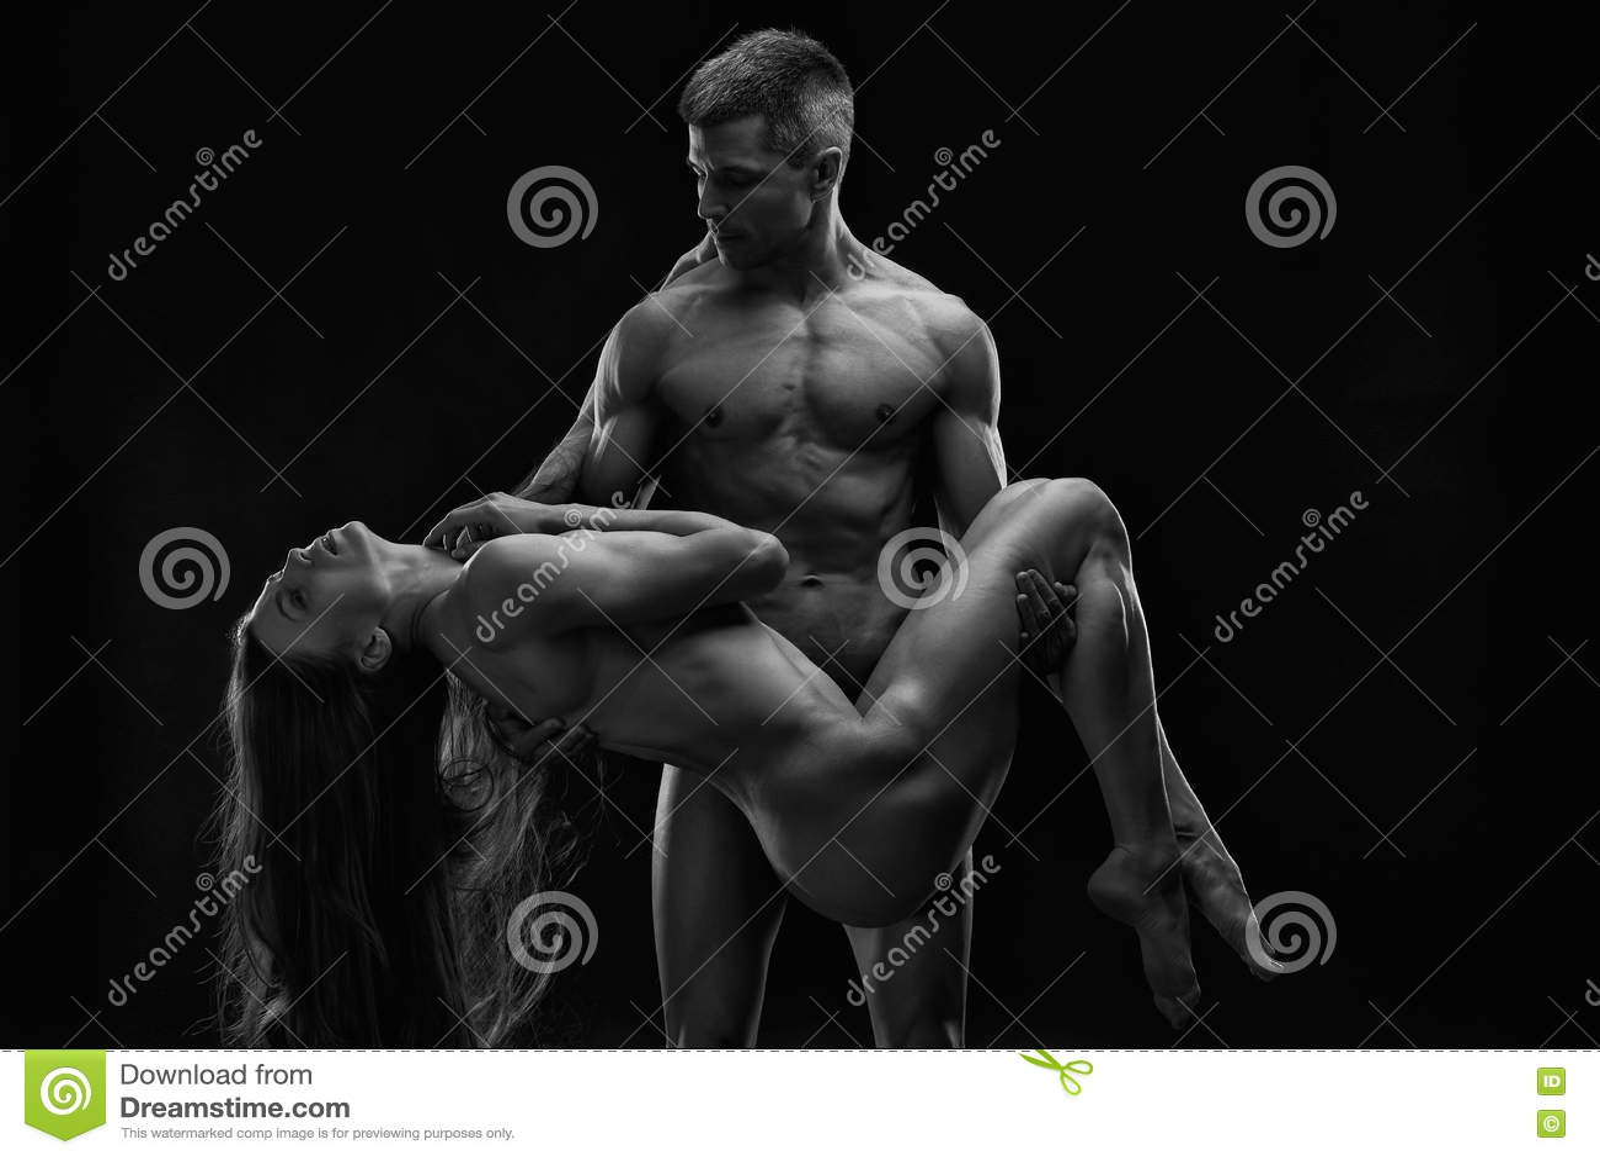 Desnudo mujer blanca hombre negro